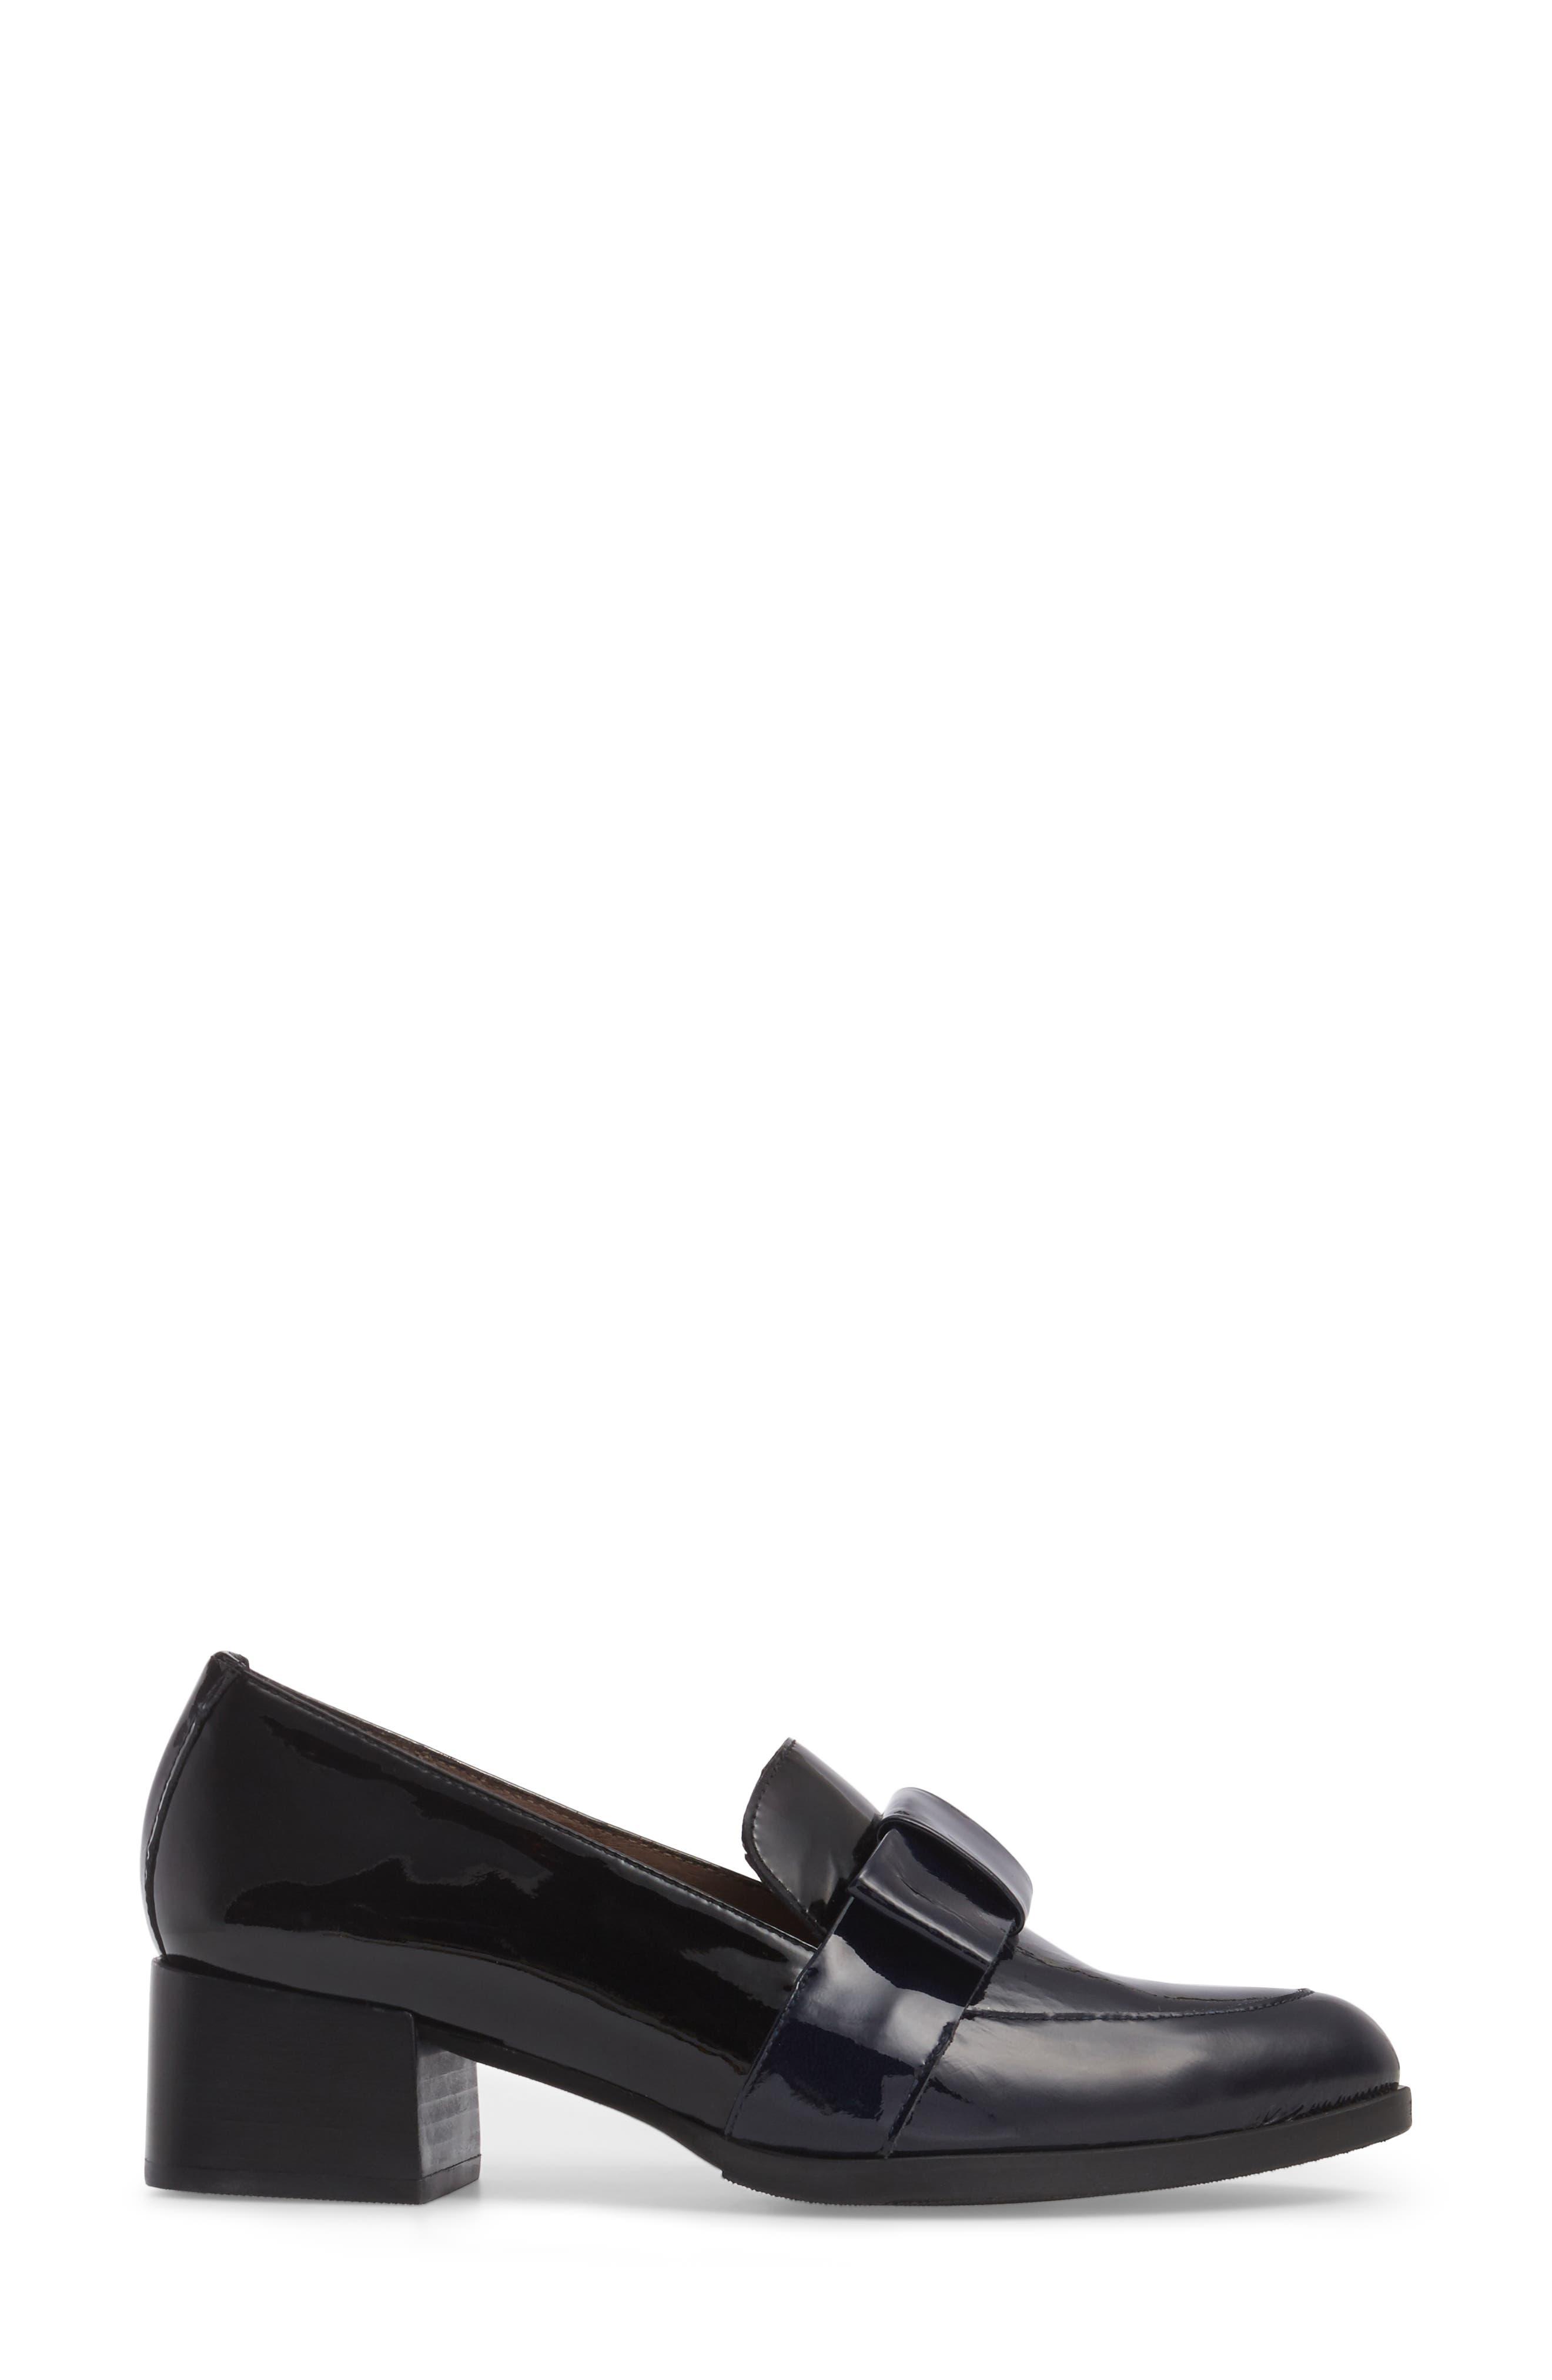 Block Heel Loafer Pump,                             Alternate thumbnail 3, color,                             Navy/ Black Patent Leather